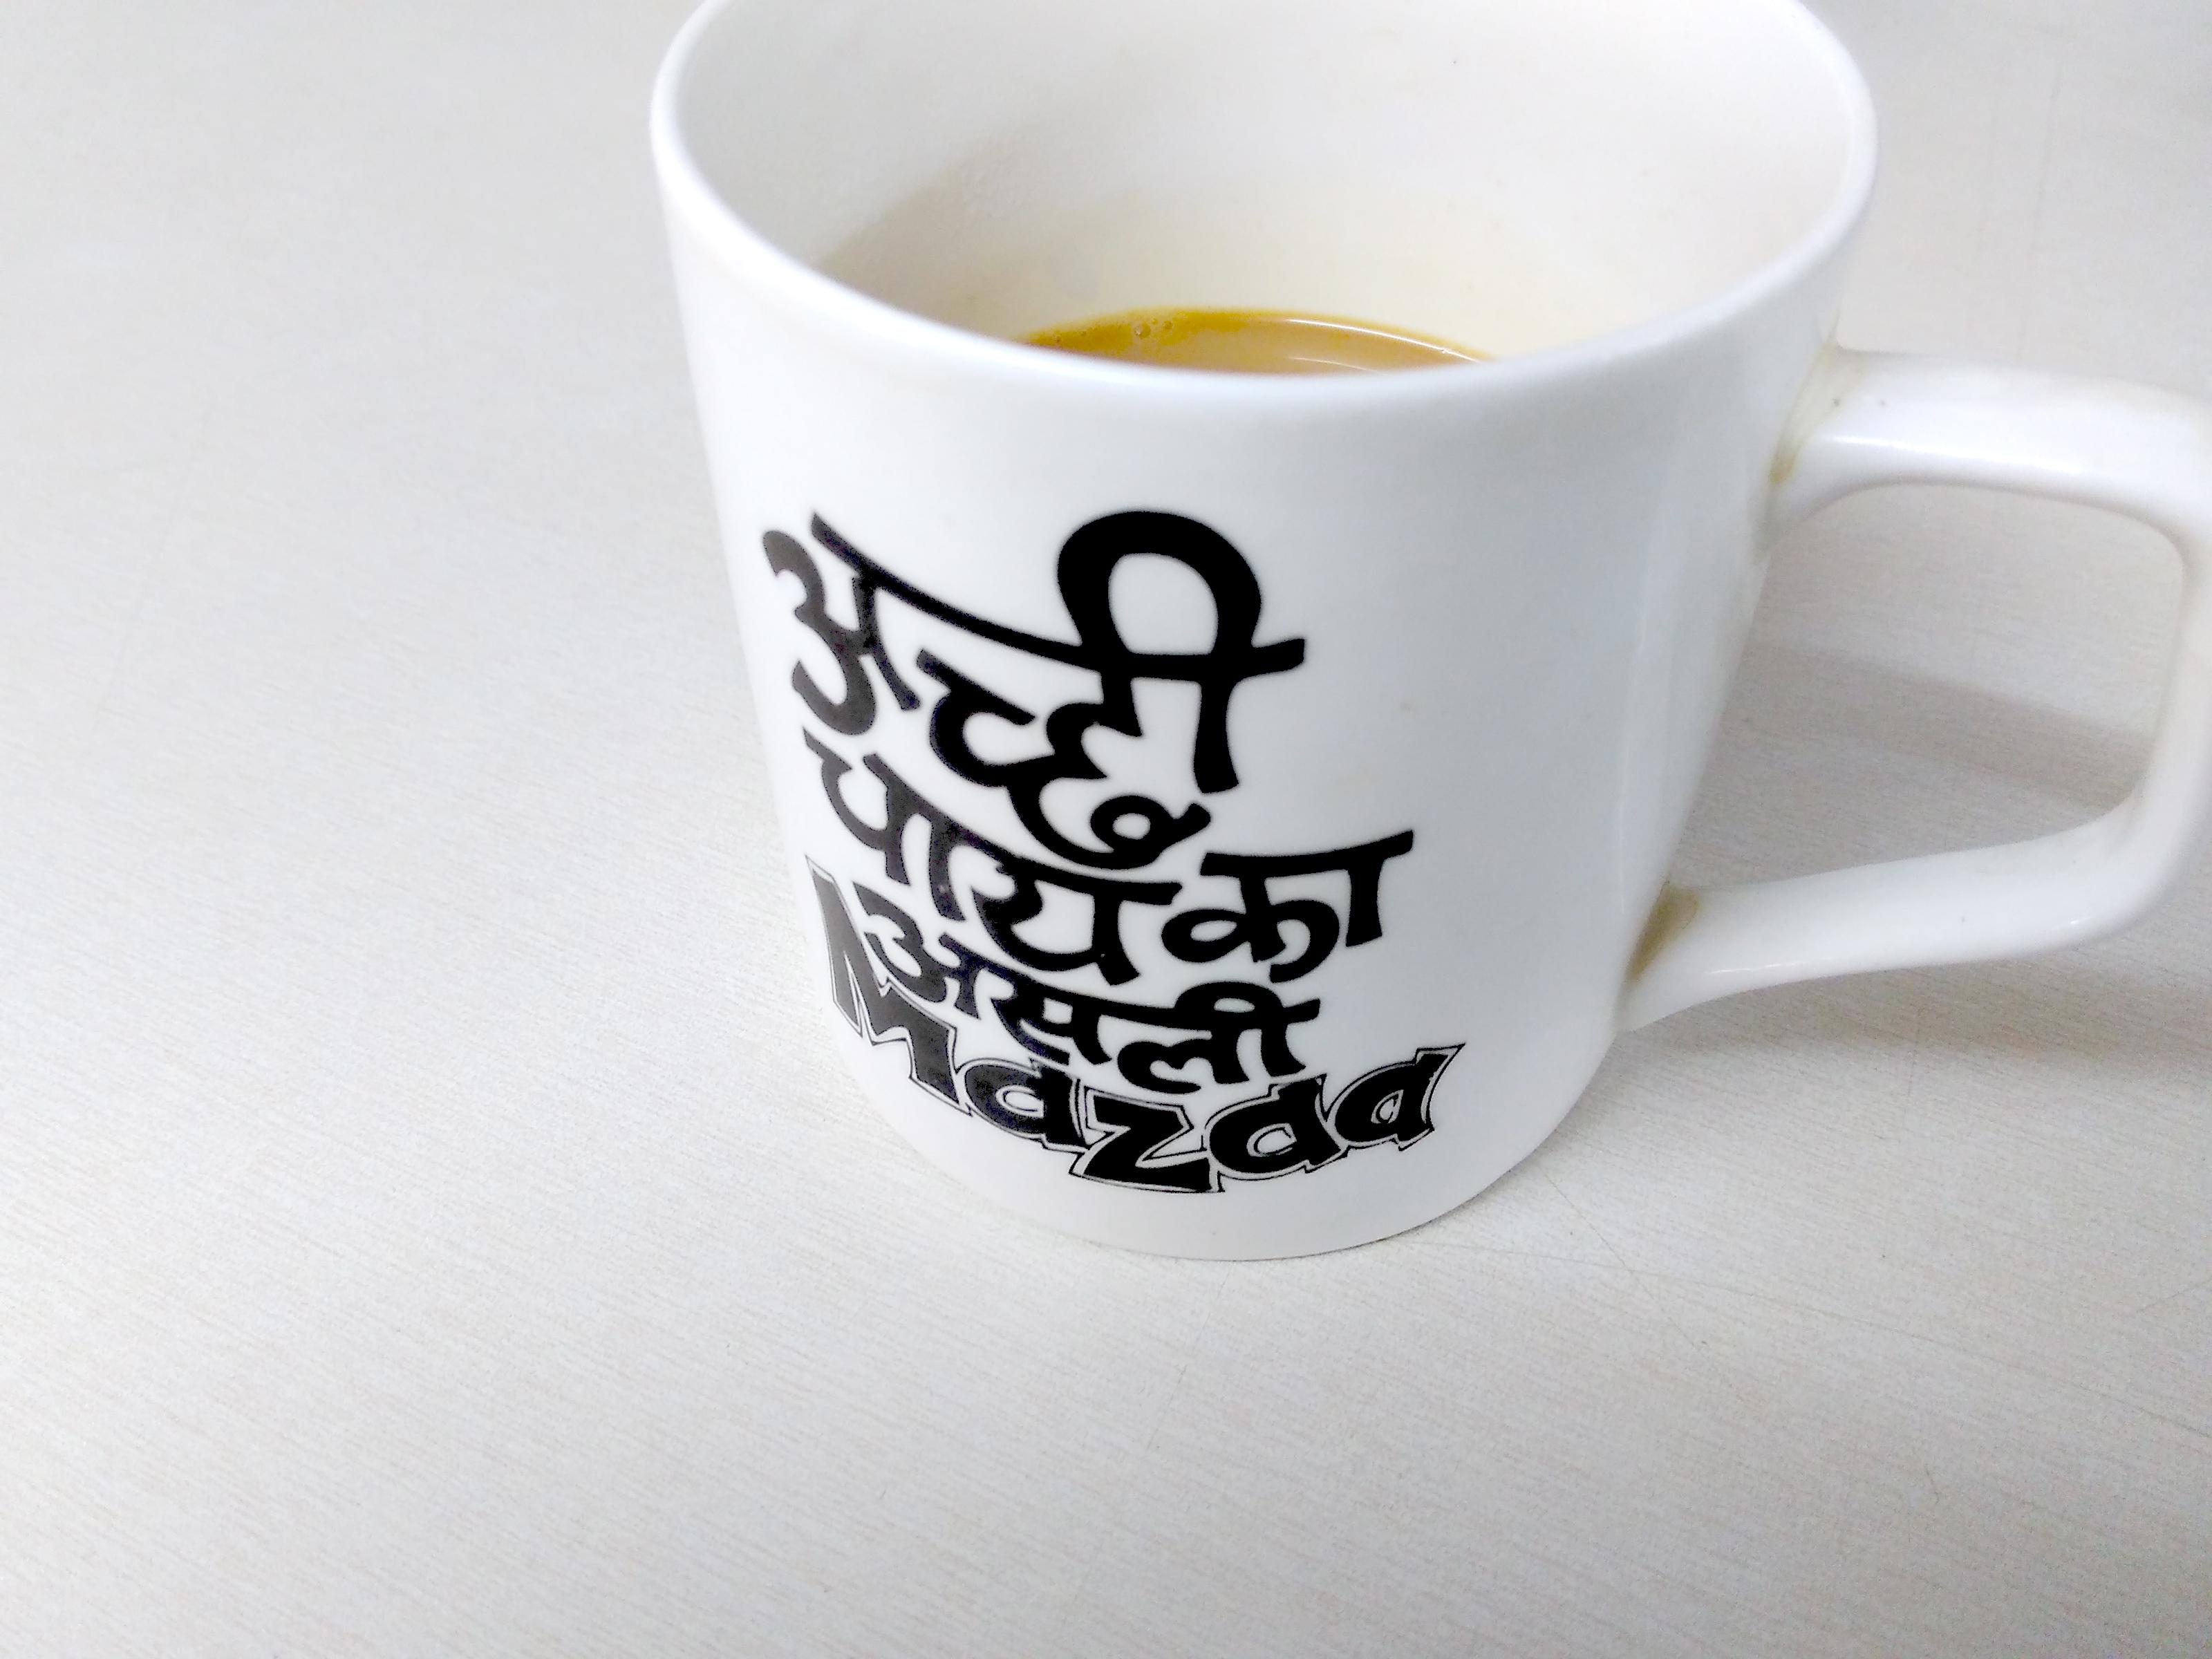 Free stock photo of asli chai, cup art, india